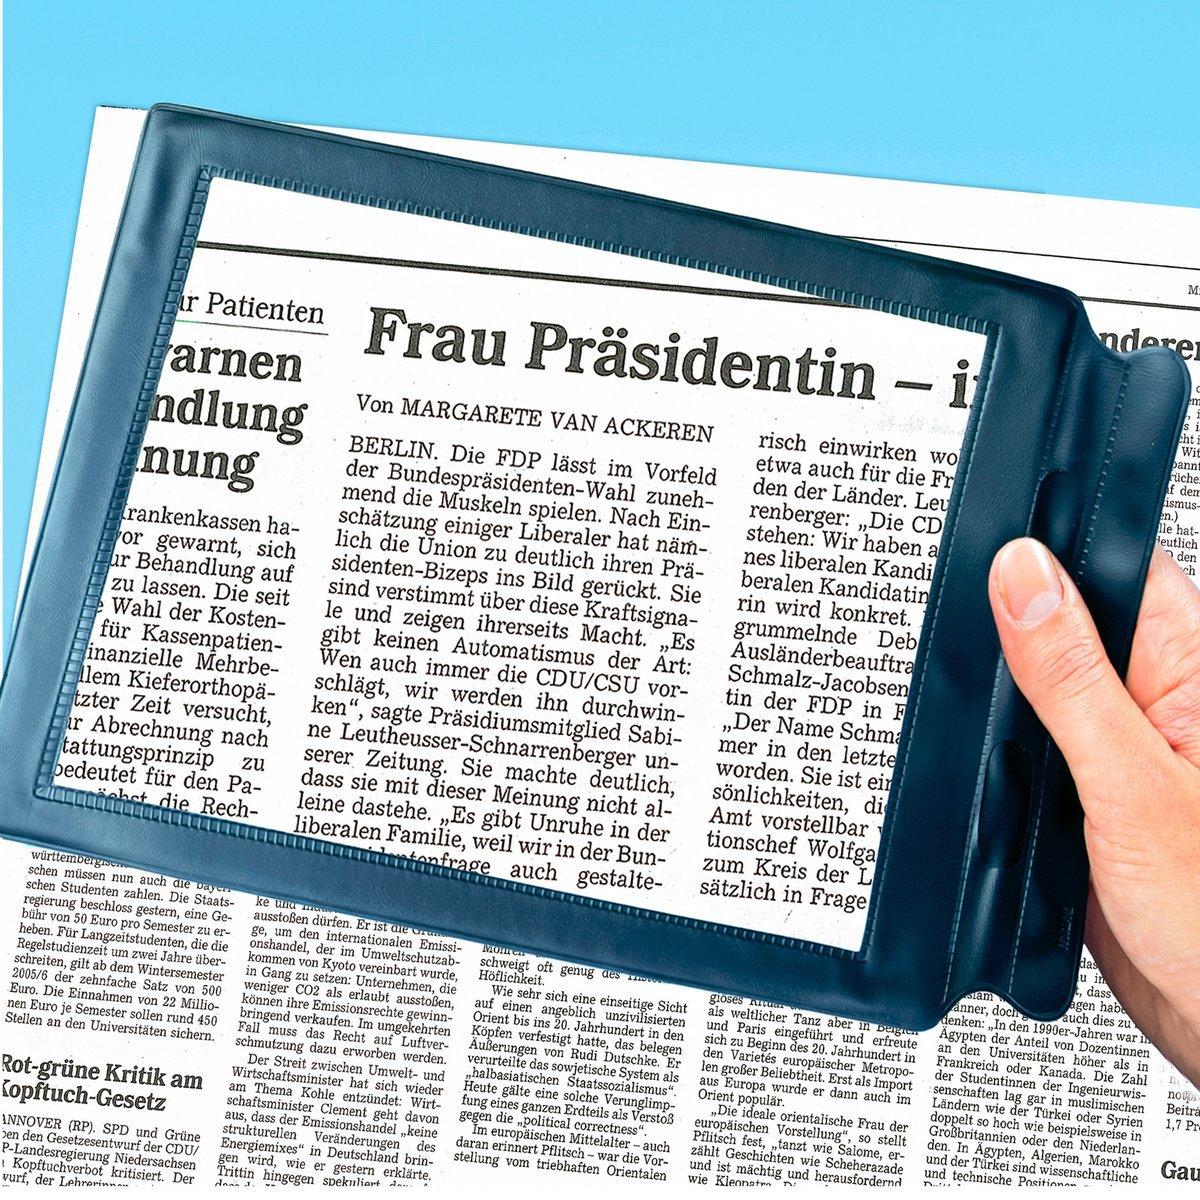 TRI Lese-Lupe 300/% Vergrößerungsglas Seniorenlupe Lesehilfe Handlupe Tischlupe